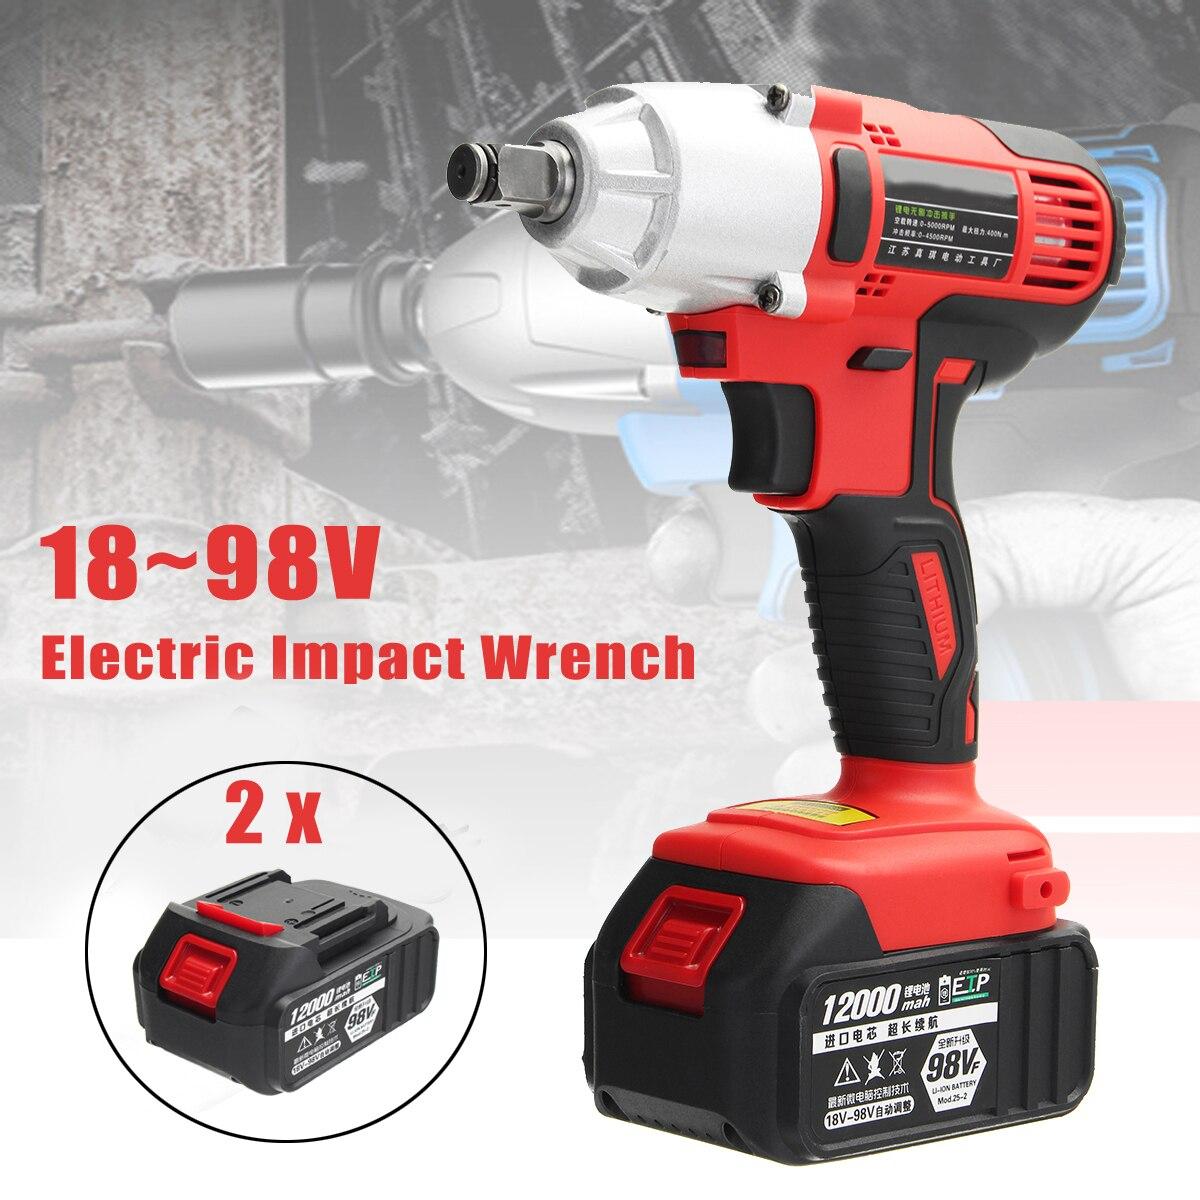 AC 100-240 V 12000 mah Avvitatore Elettrico 400Nm Lithium-Ion Cordless Impact Wrench 2 Batterie 1 Caricabatterie Strumento di potere